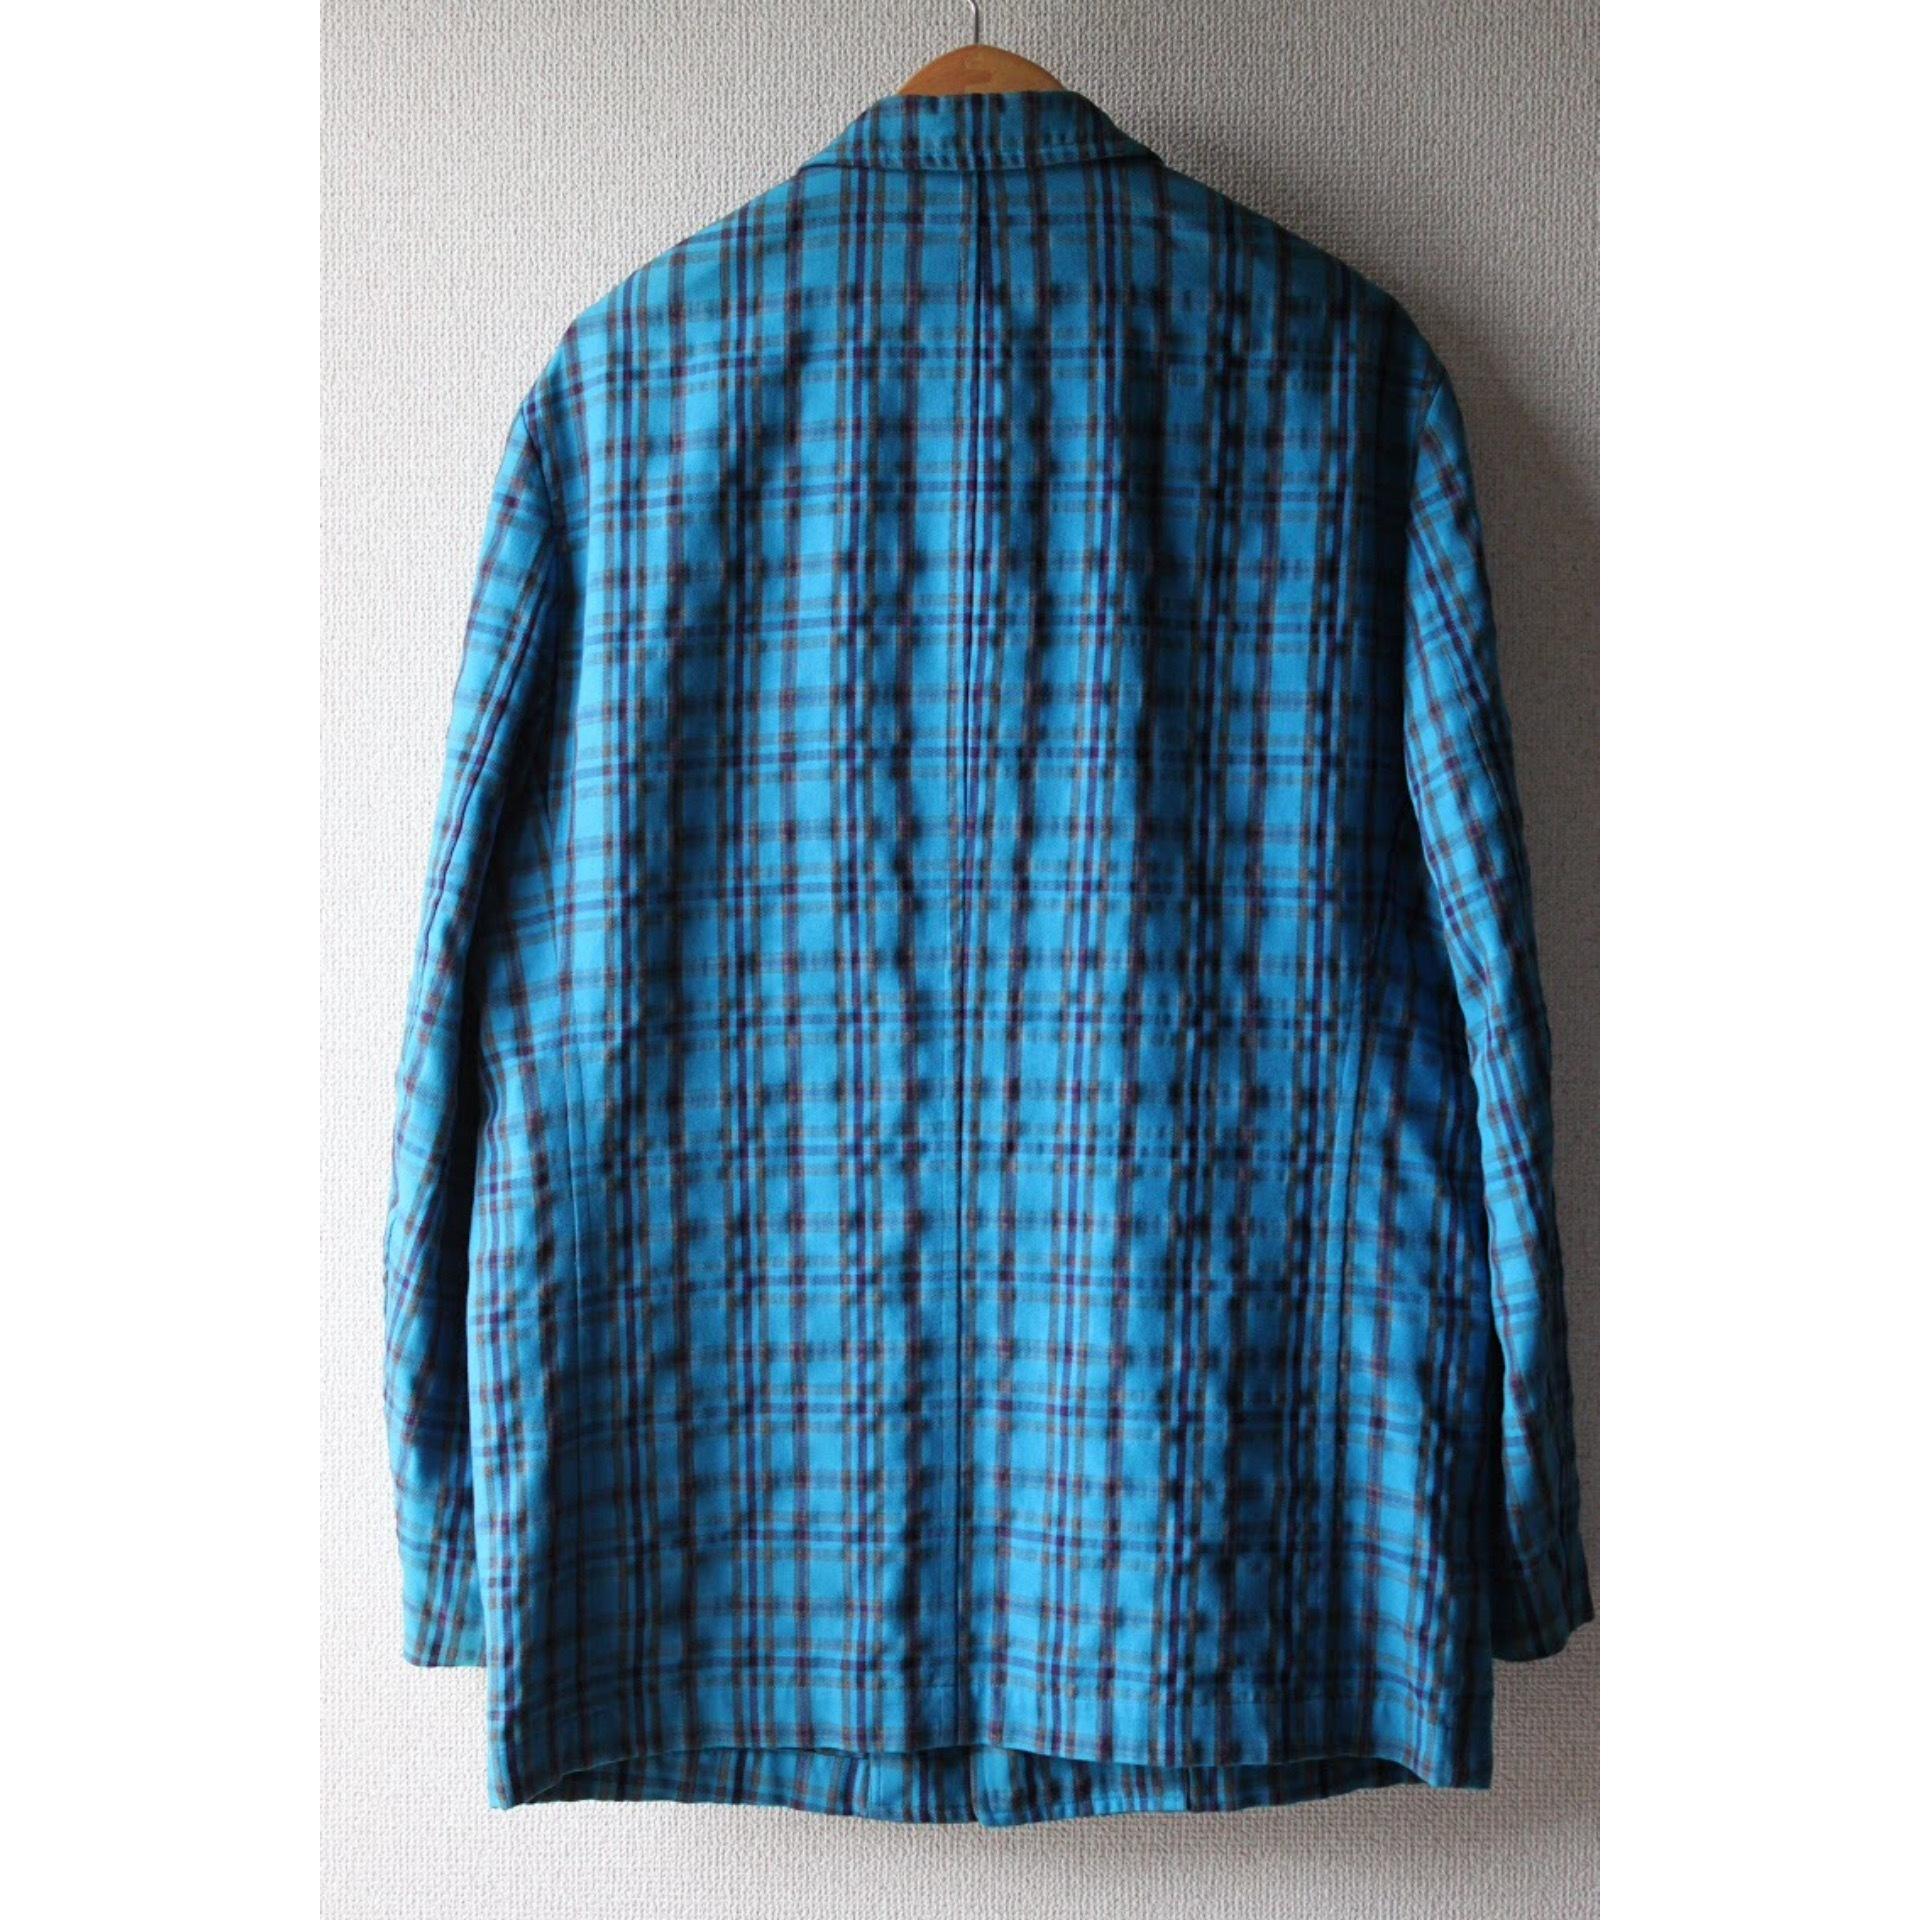 Check tailored jacket by COMME des GARÇONS HOMME PLUS